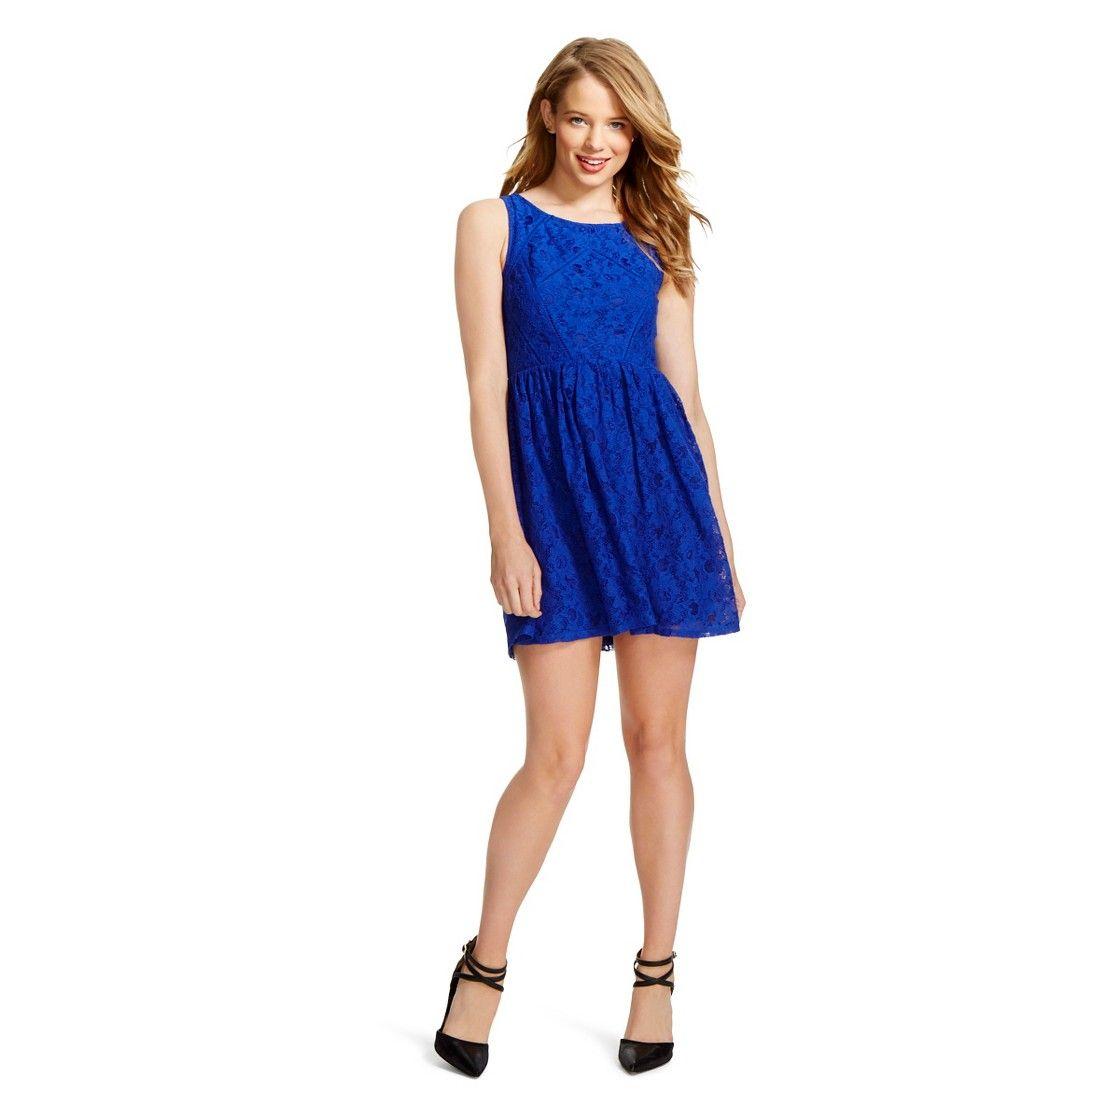 Royal blue lace dress styles  Lattice Lace Dress Royal Blue  Xhilaration   Dresses I like